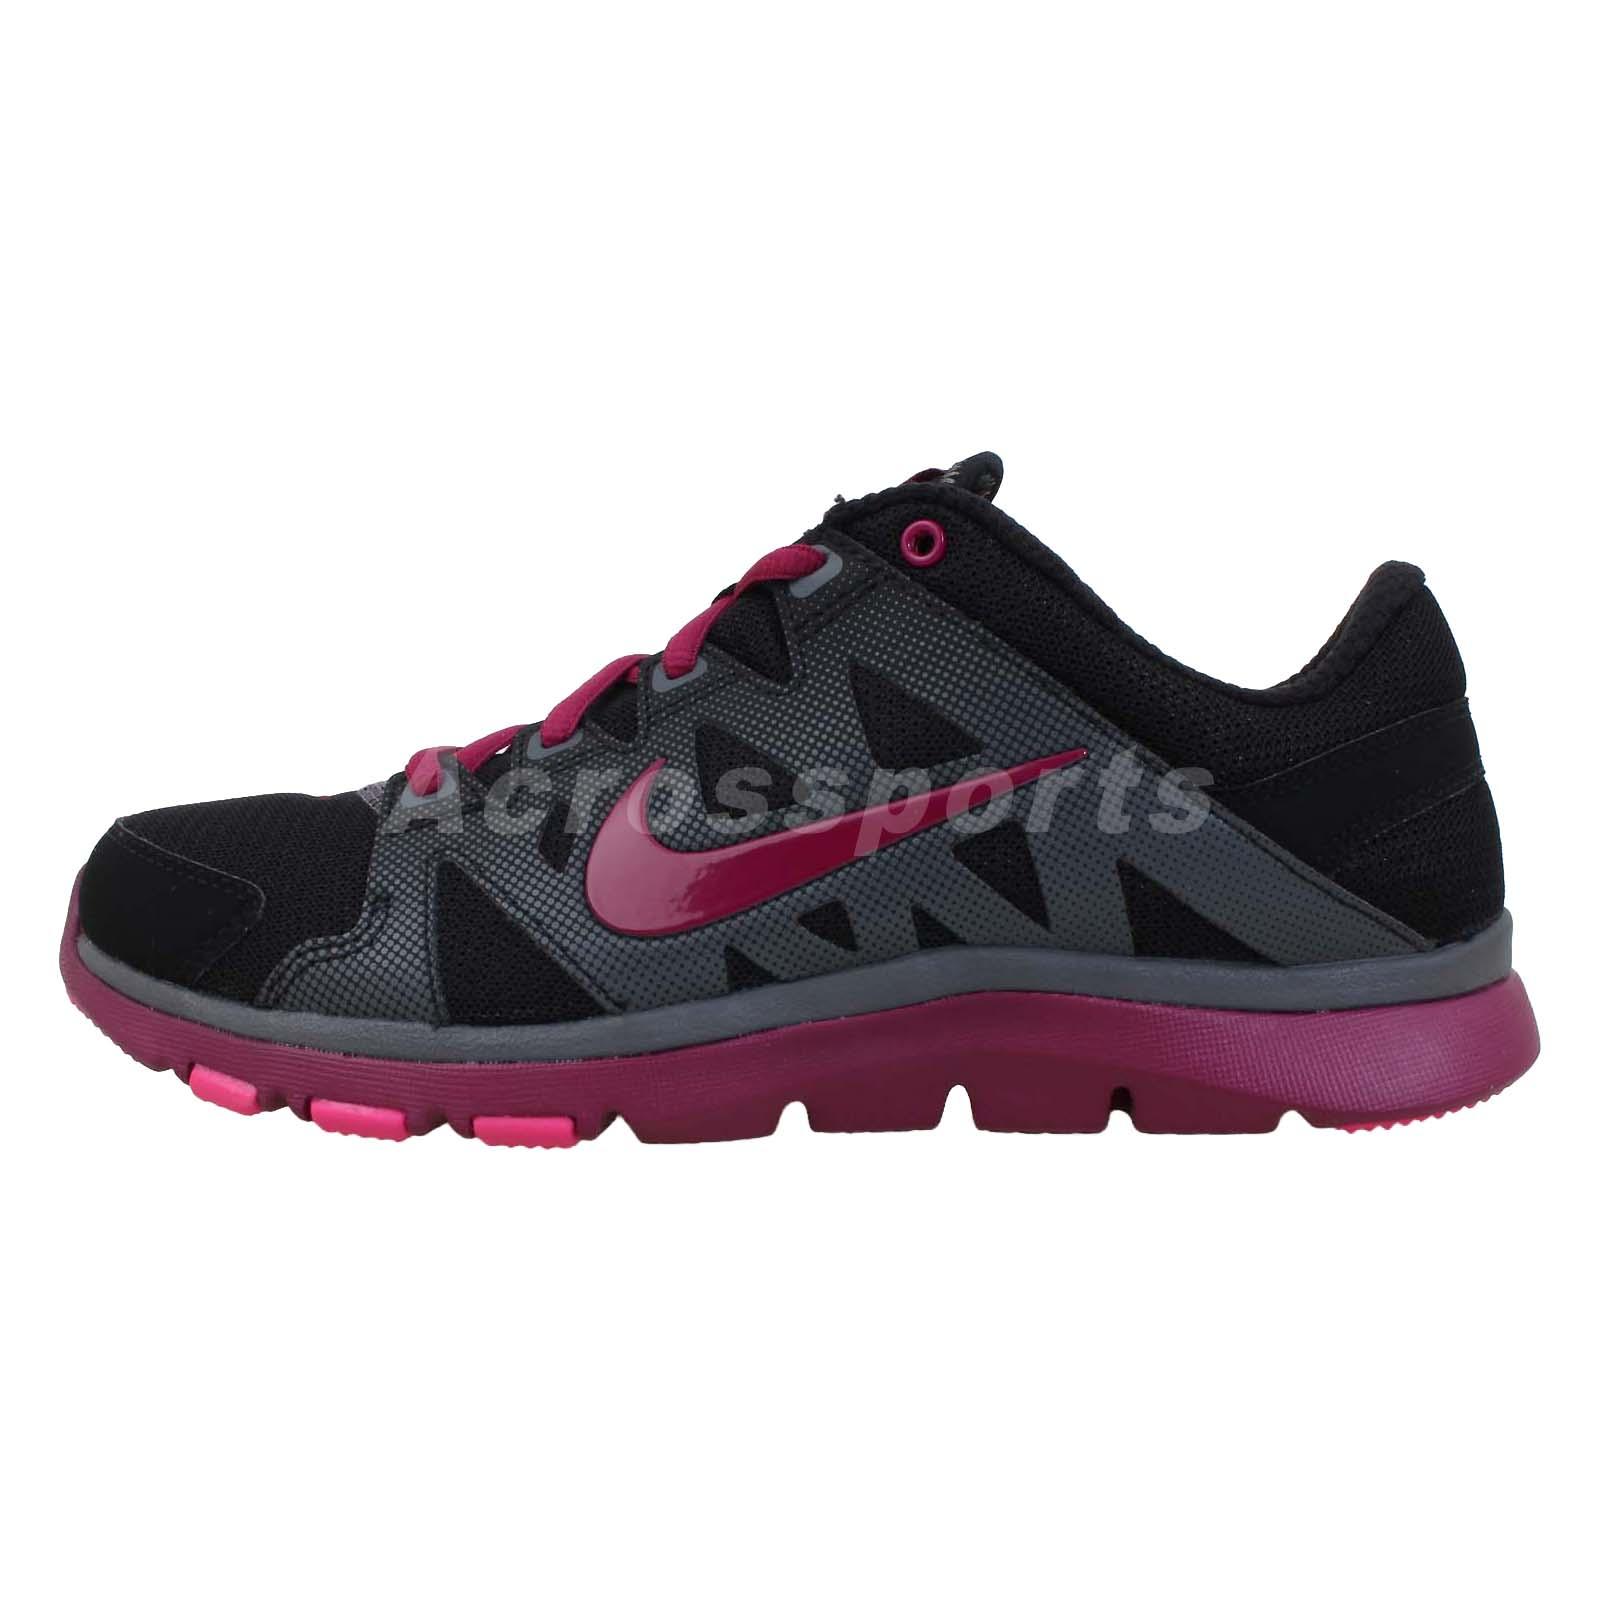 Nike Flex Tr 2 Women Price - Musée des impressionnismes Giverny b2324c1d424bb